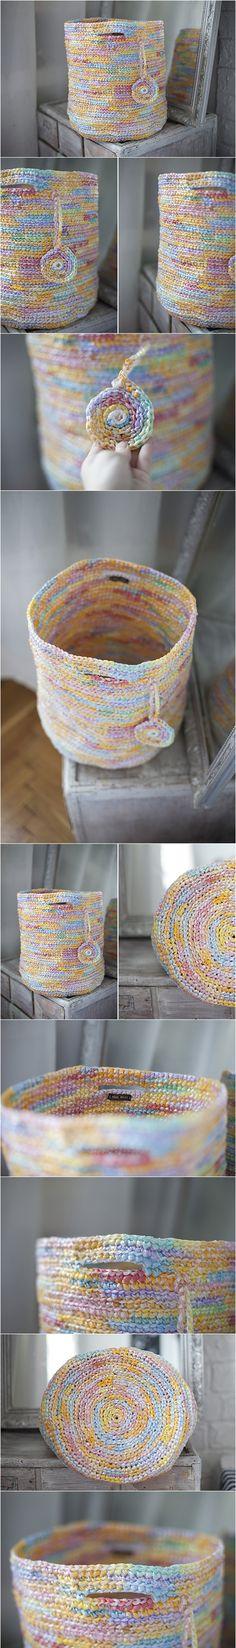 upcycled basket, recycling, toy storage, storage